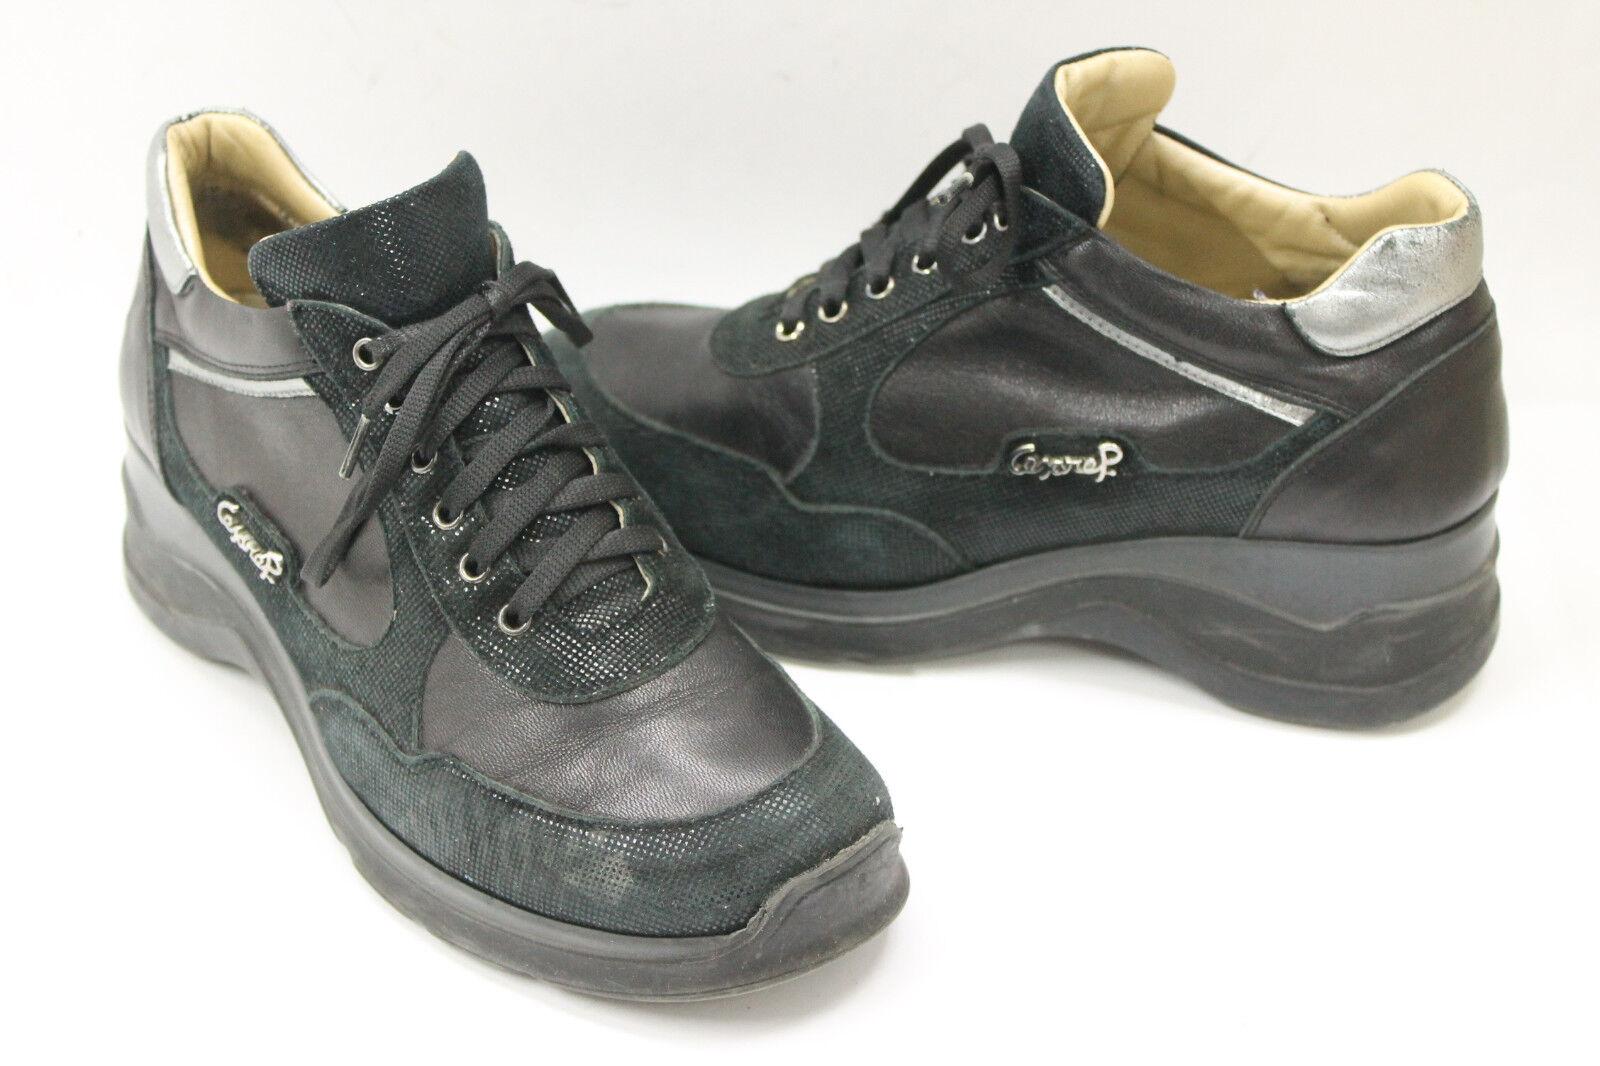 CESARE PACIOTTI women shoes sz 6 Europe Europe Europe 36 black leather S7221 57ab8f